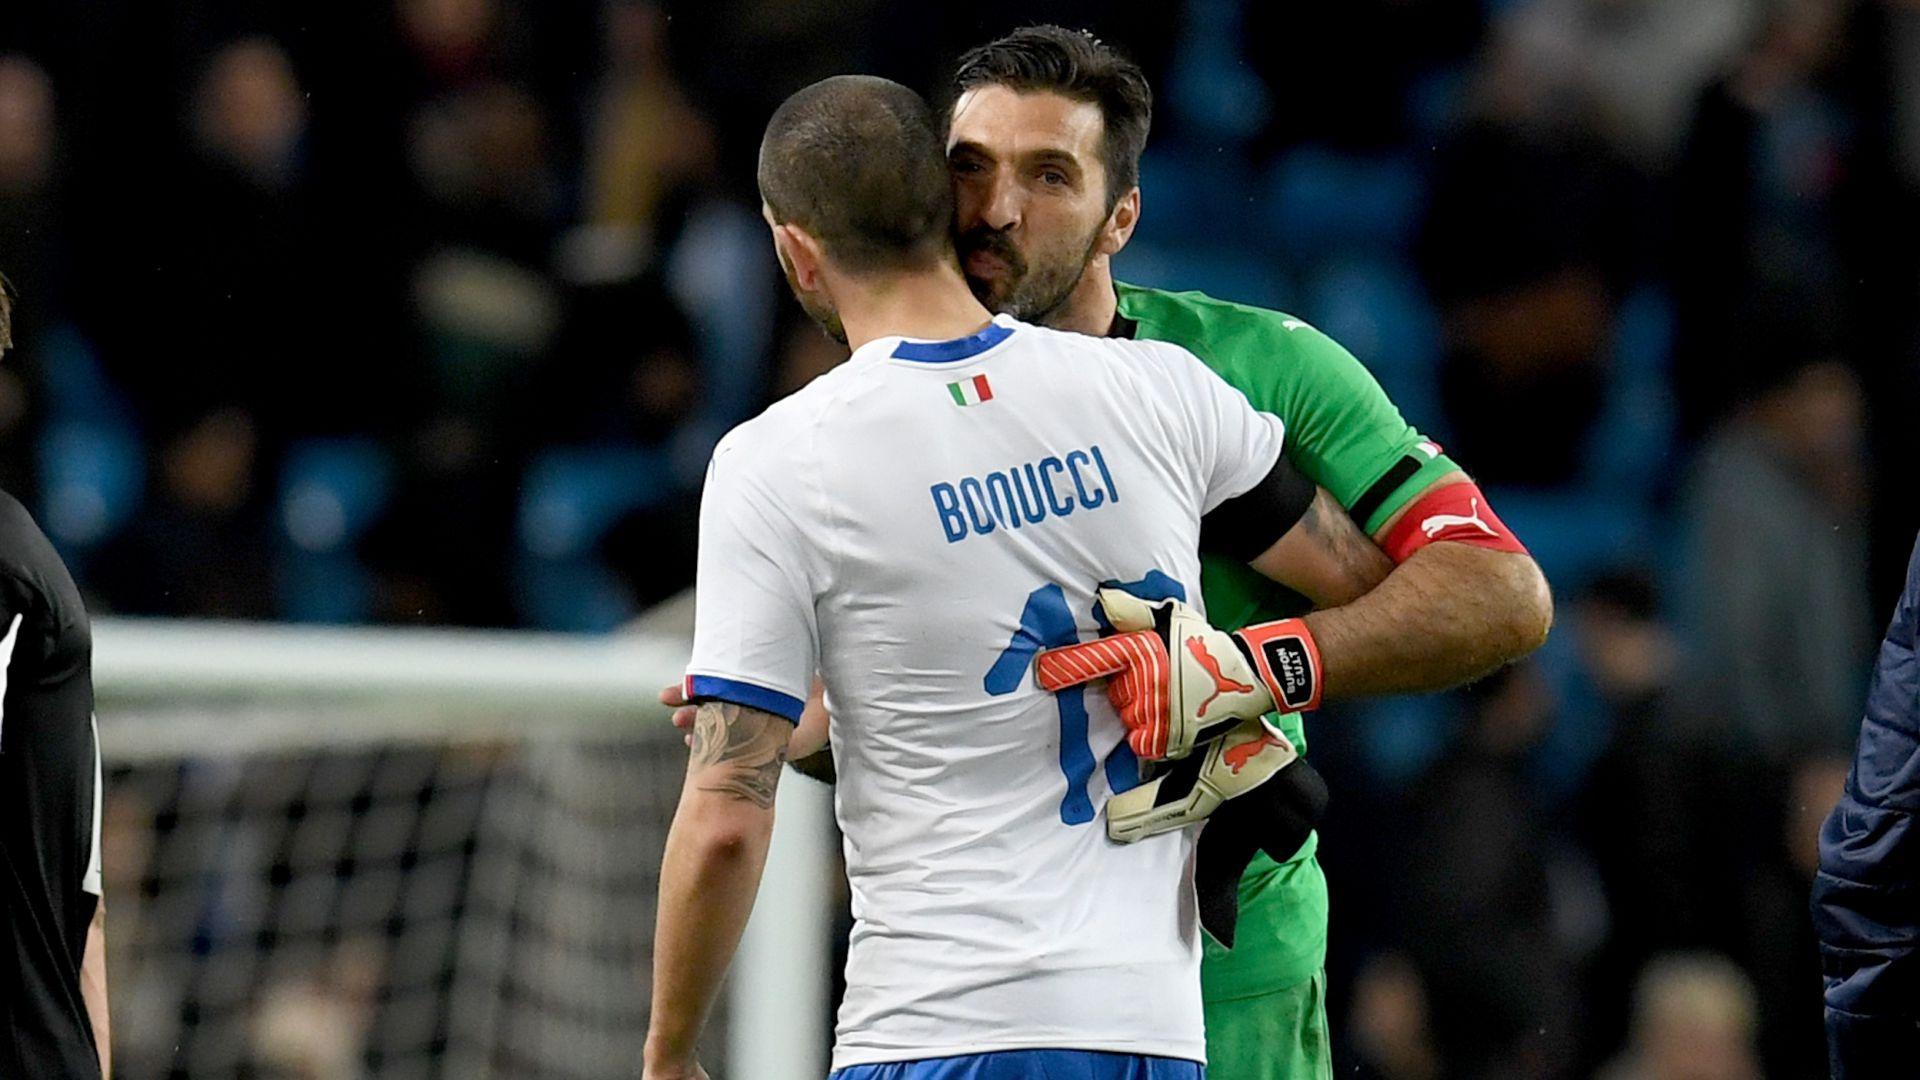 Buffon Bonucci - Italy